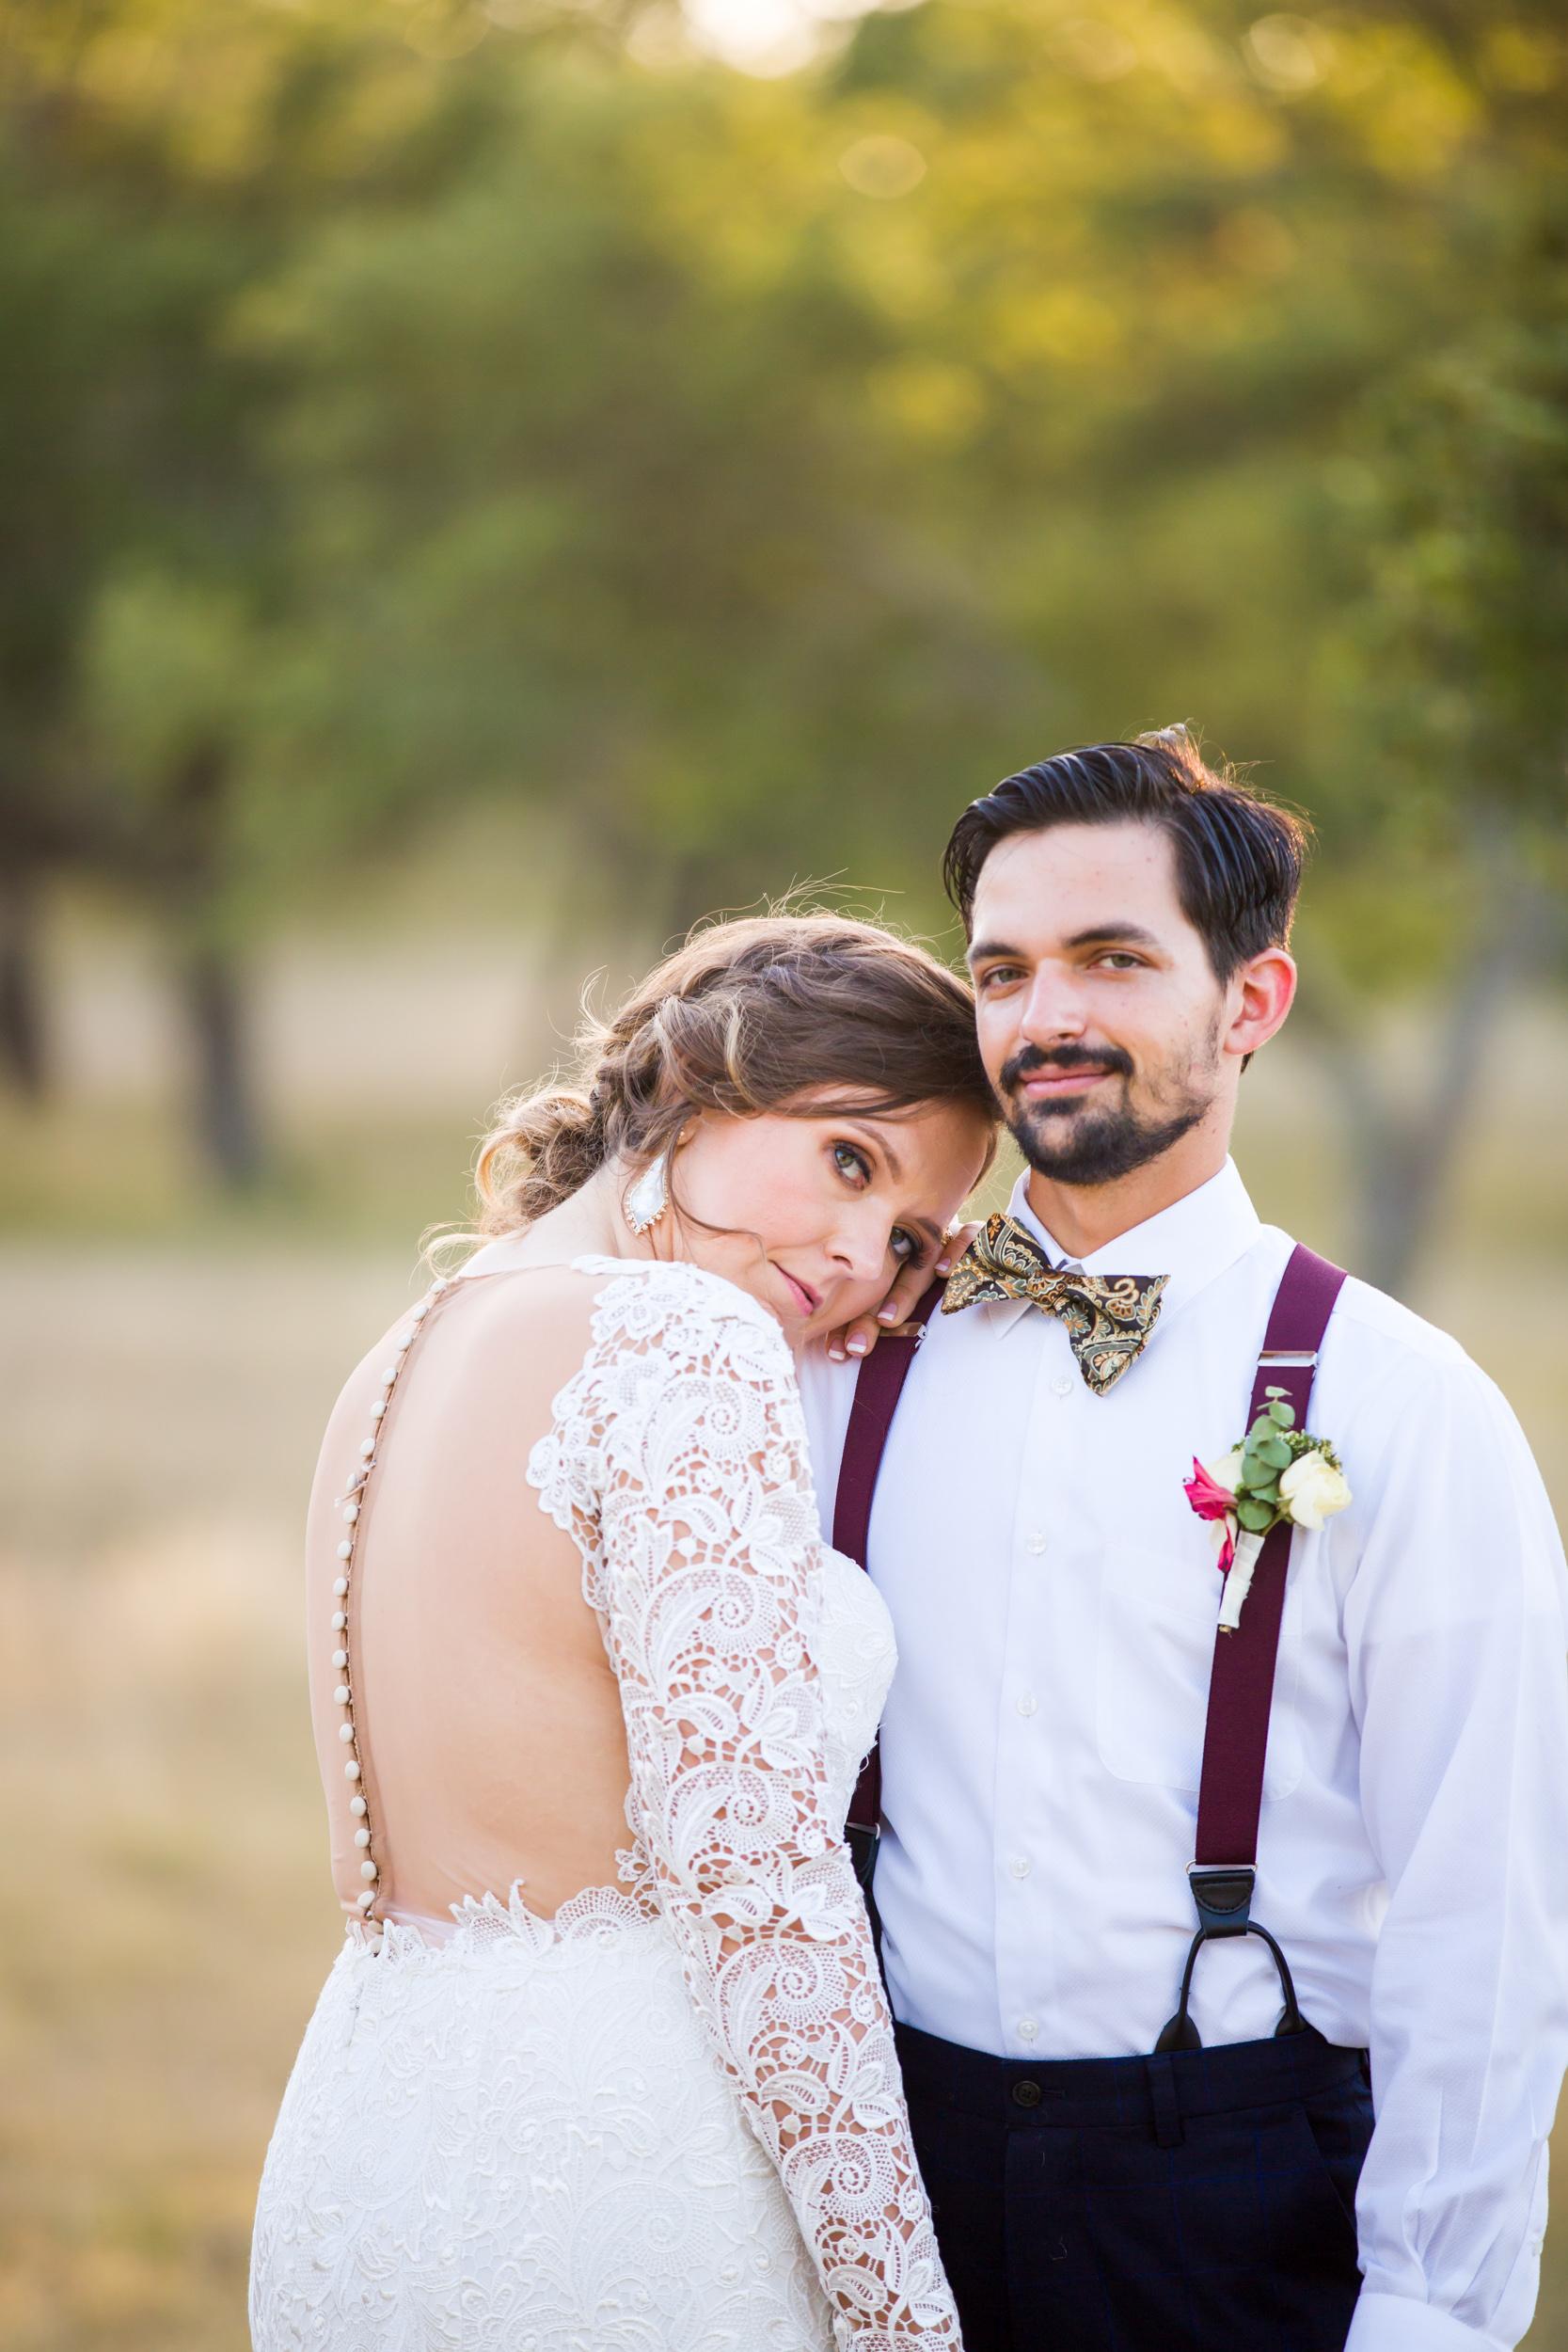 austin-wedding-colorful-41.jpg